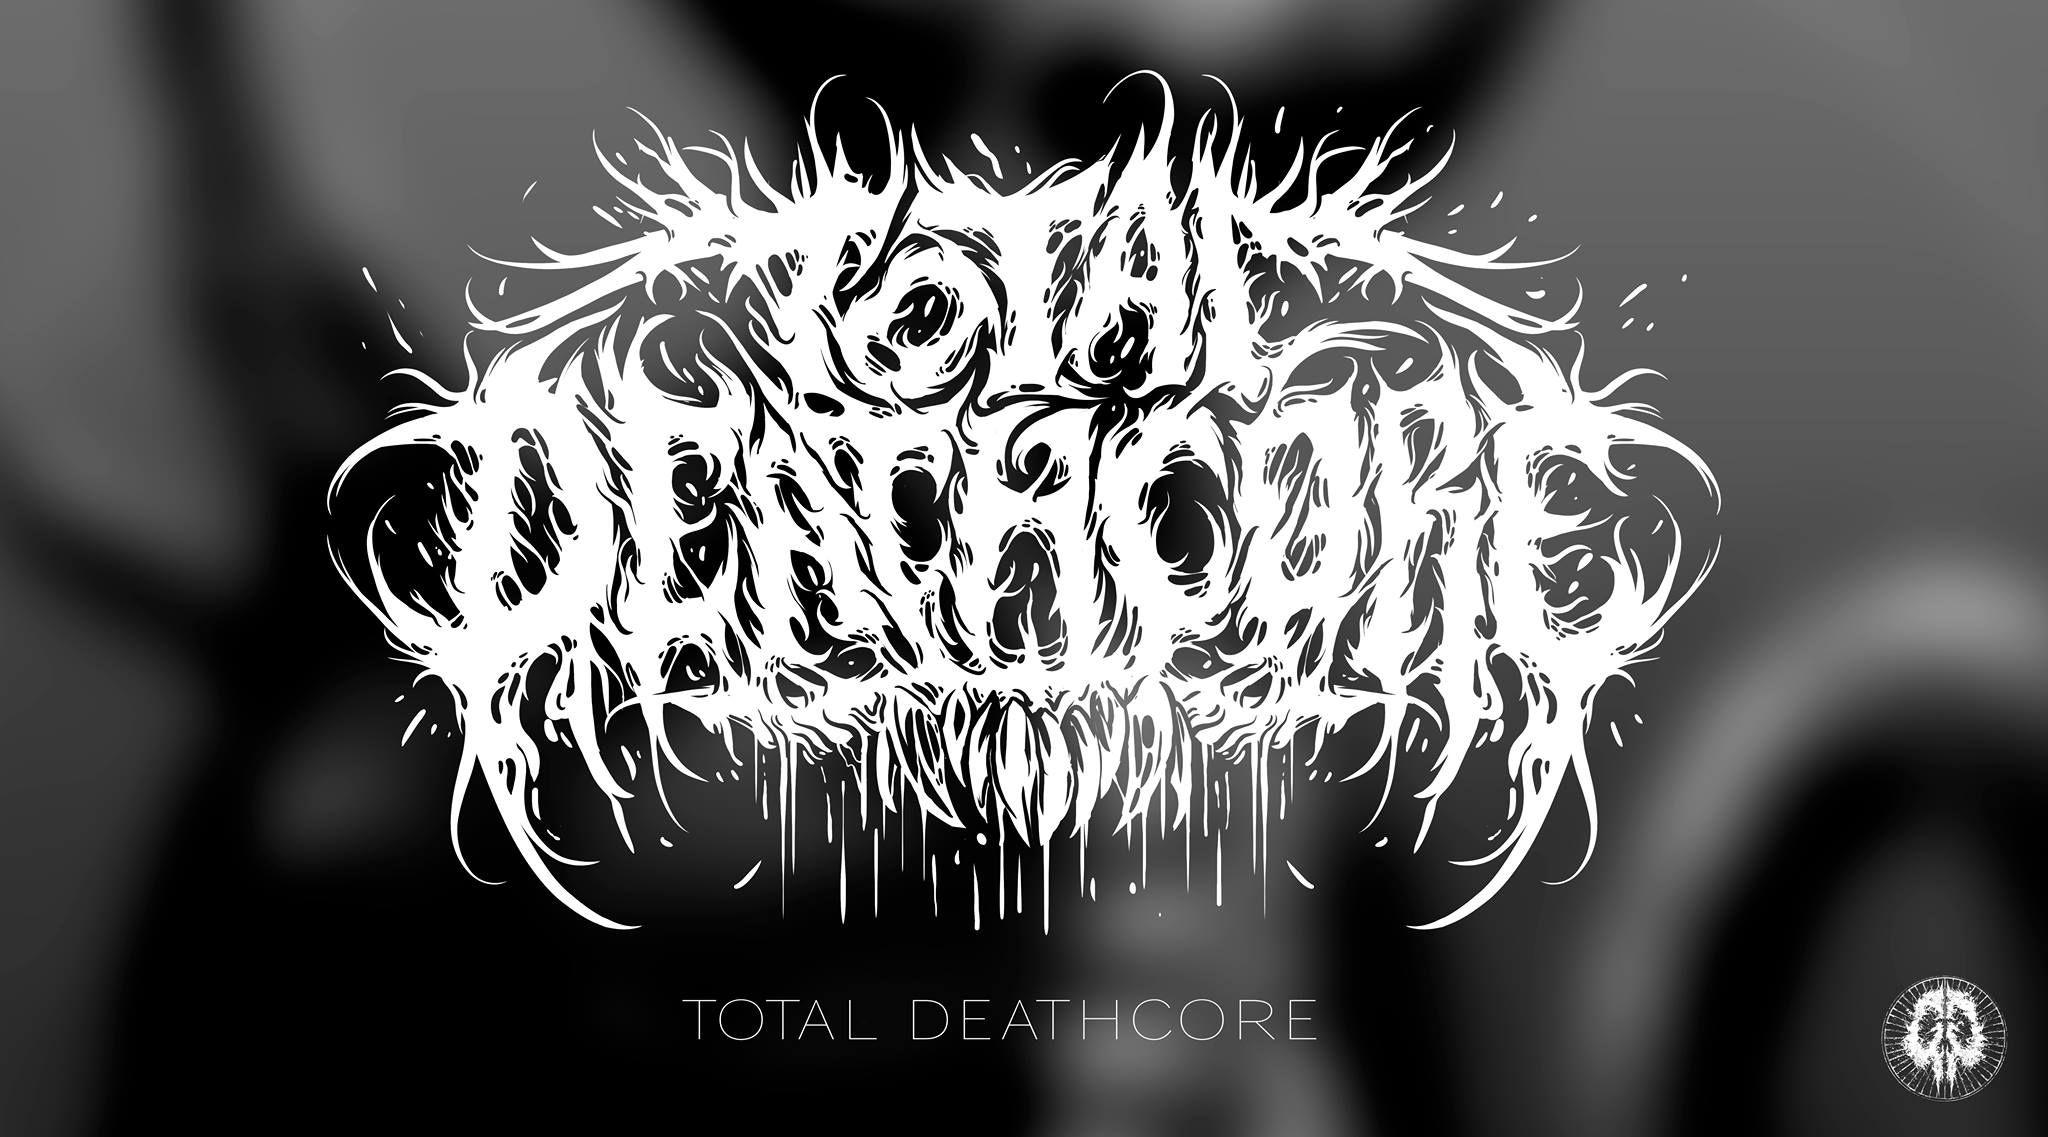 Total deathcore glorious gorification black metal logo inspiration neon signs